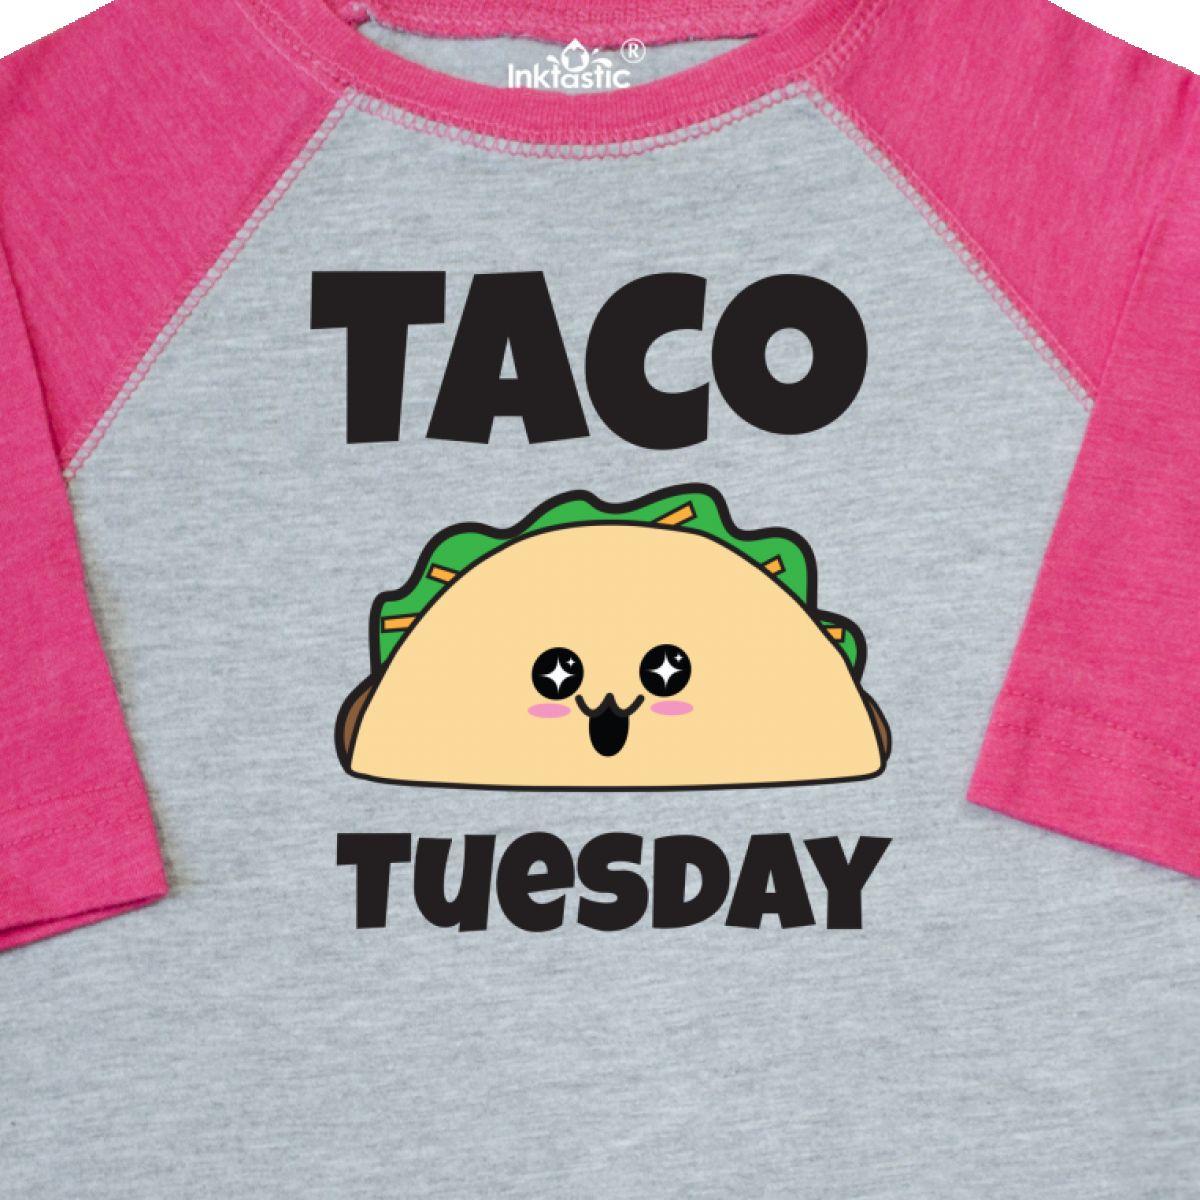 4adc183f2 Inktastic Kawaii Taco Tuesday Toddler T-Shirt Harajuku Japanese Food ...